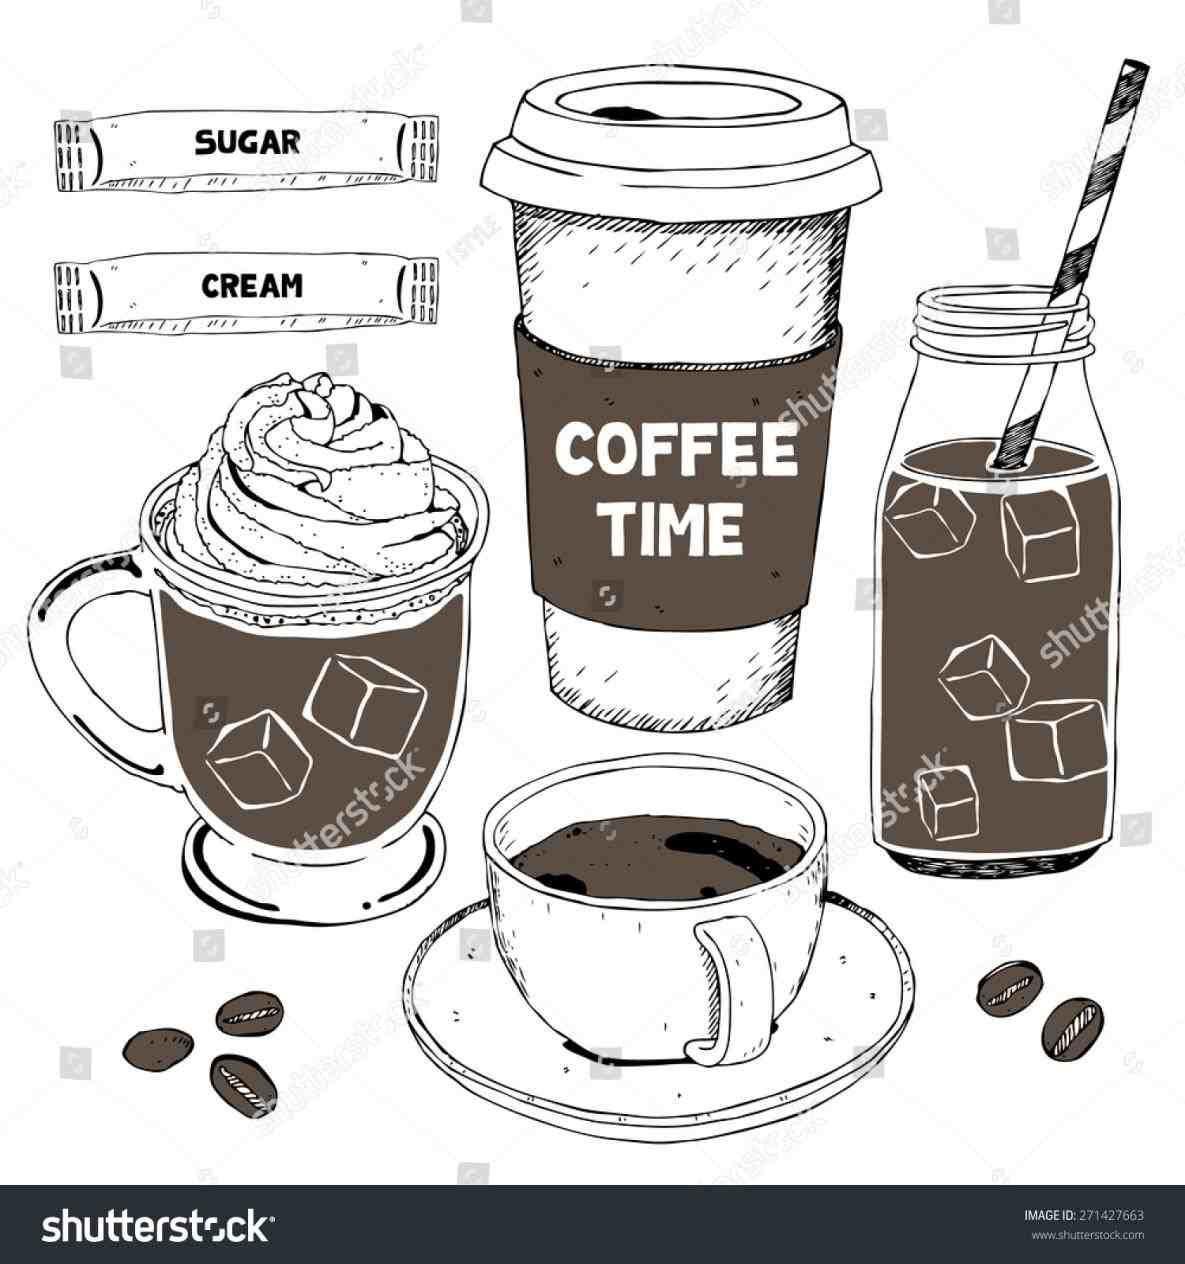 Bobayule Com Bobayule On Budget Ideas Coffee Infographic Coffee Drawing Coffee Bullet